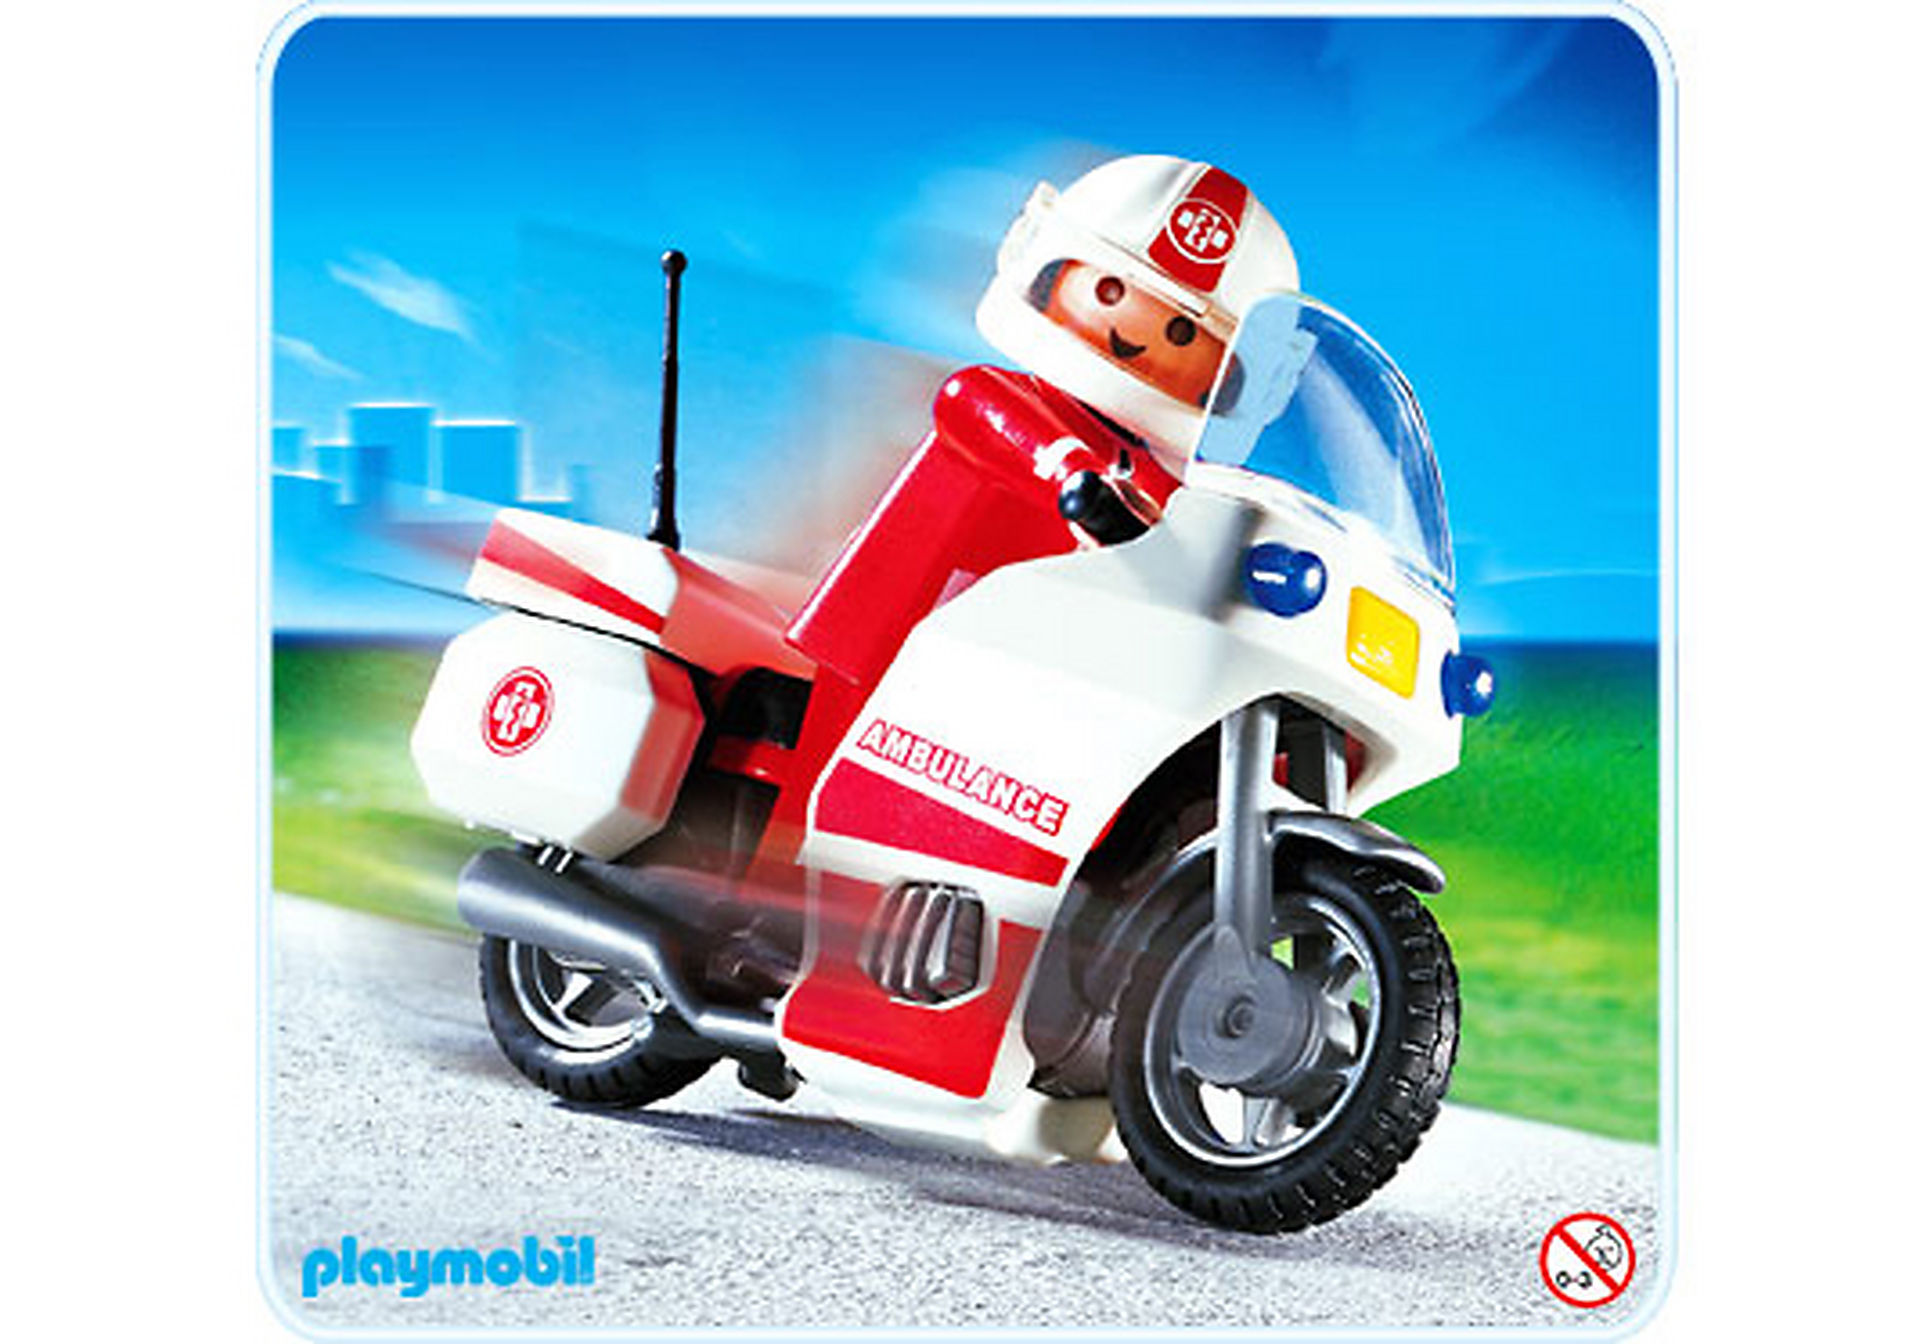 4224-A Notarzt-Motorrad zoom image1